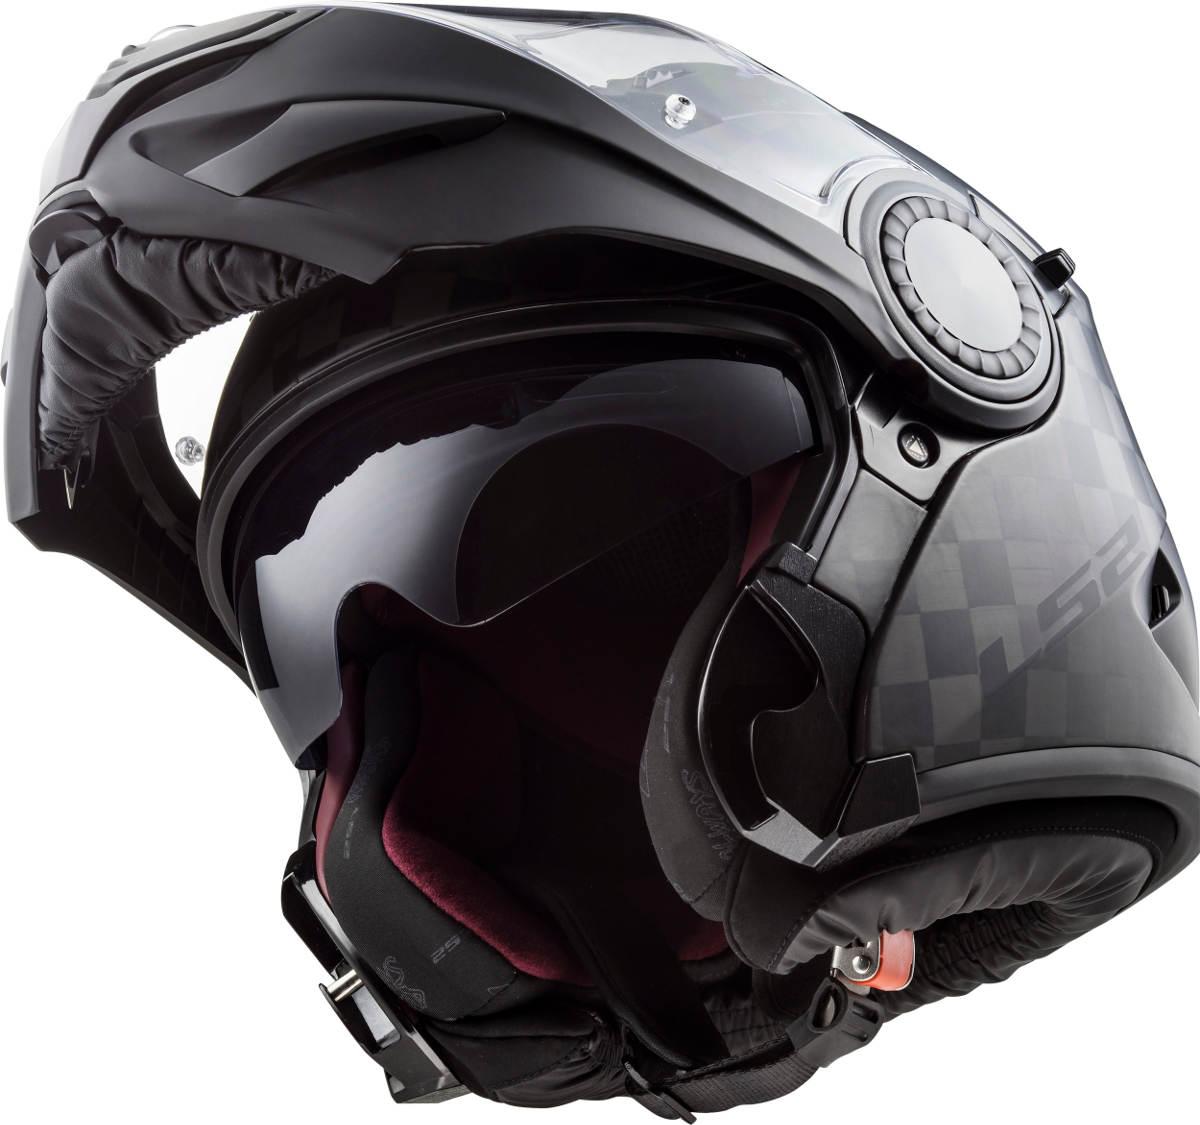 LS2 Vortex Carbon Fibre Modular Motorcycle Helmet Flipped Front Up